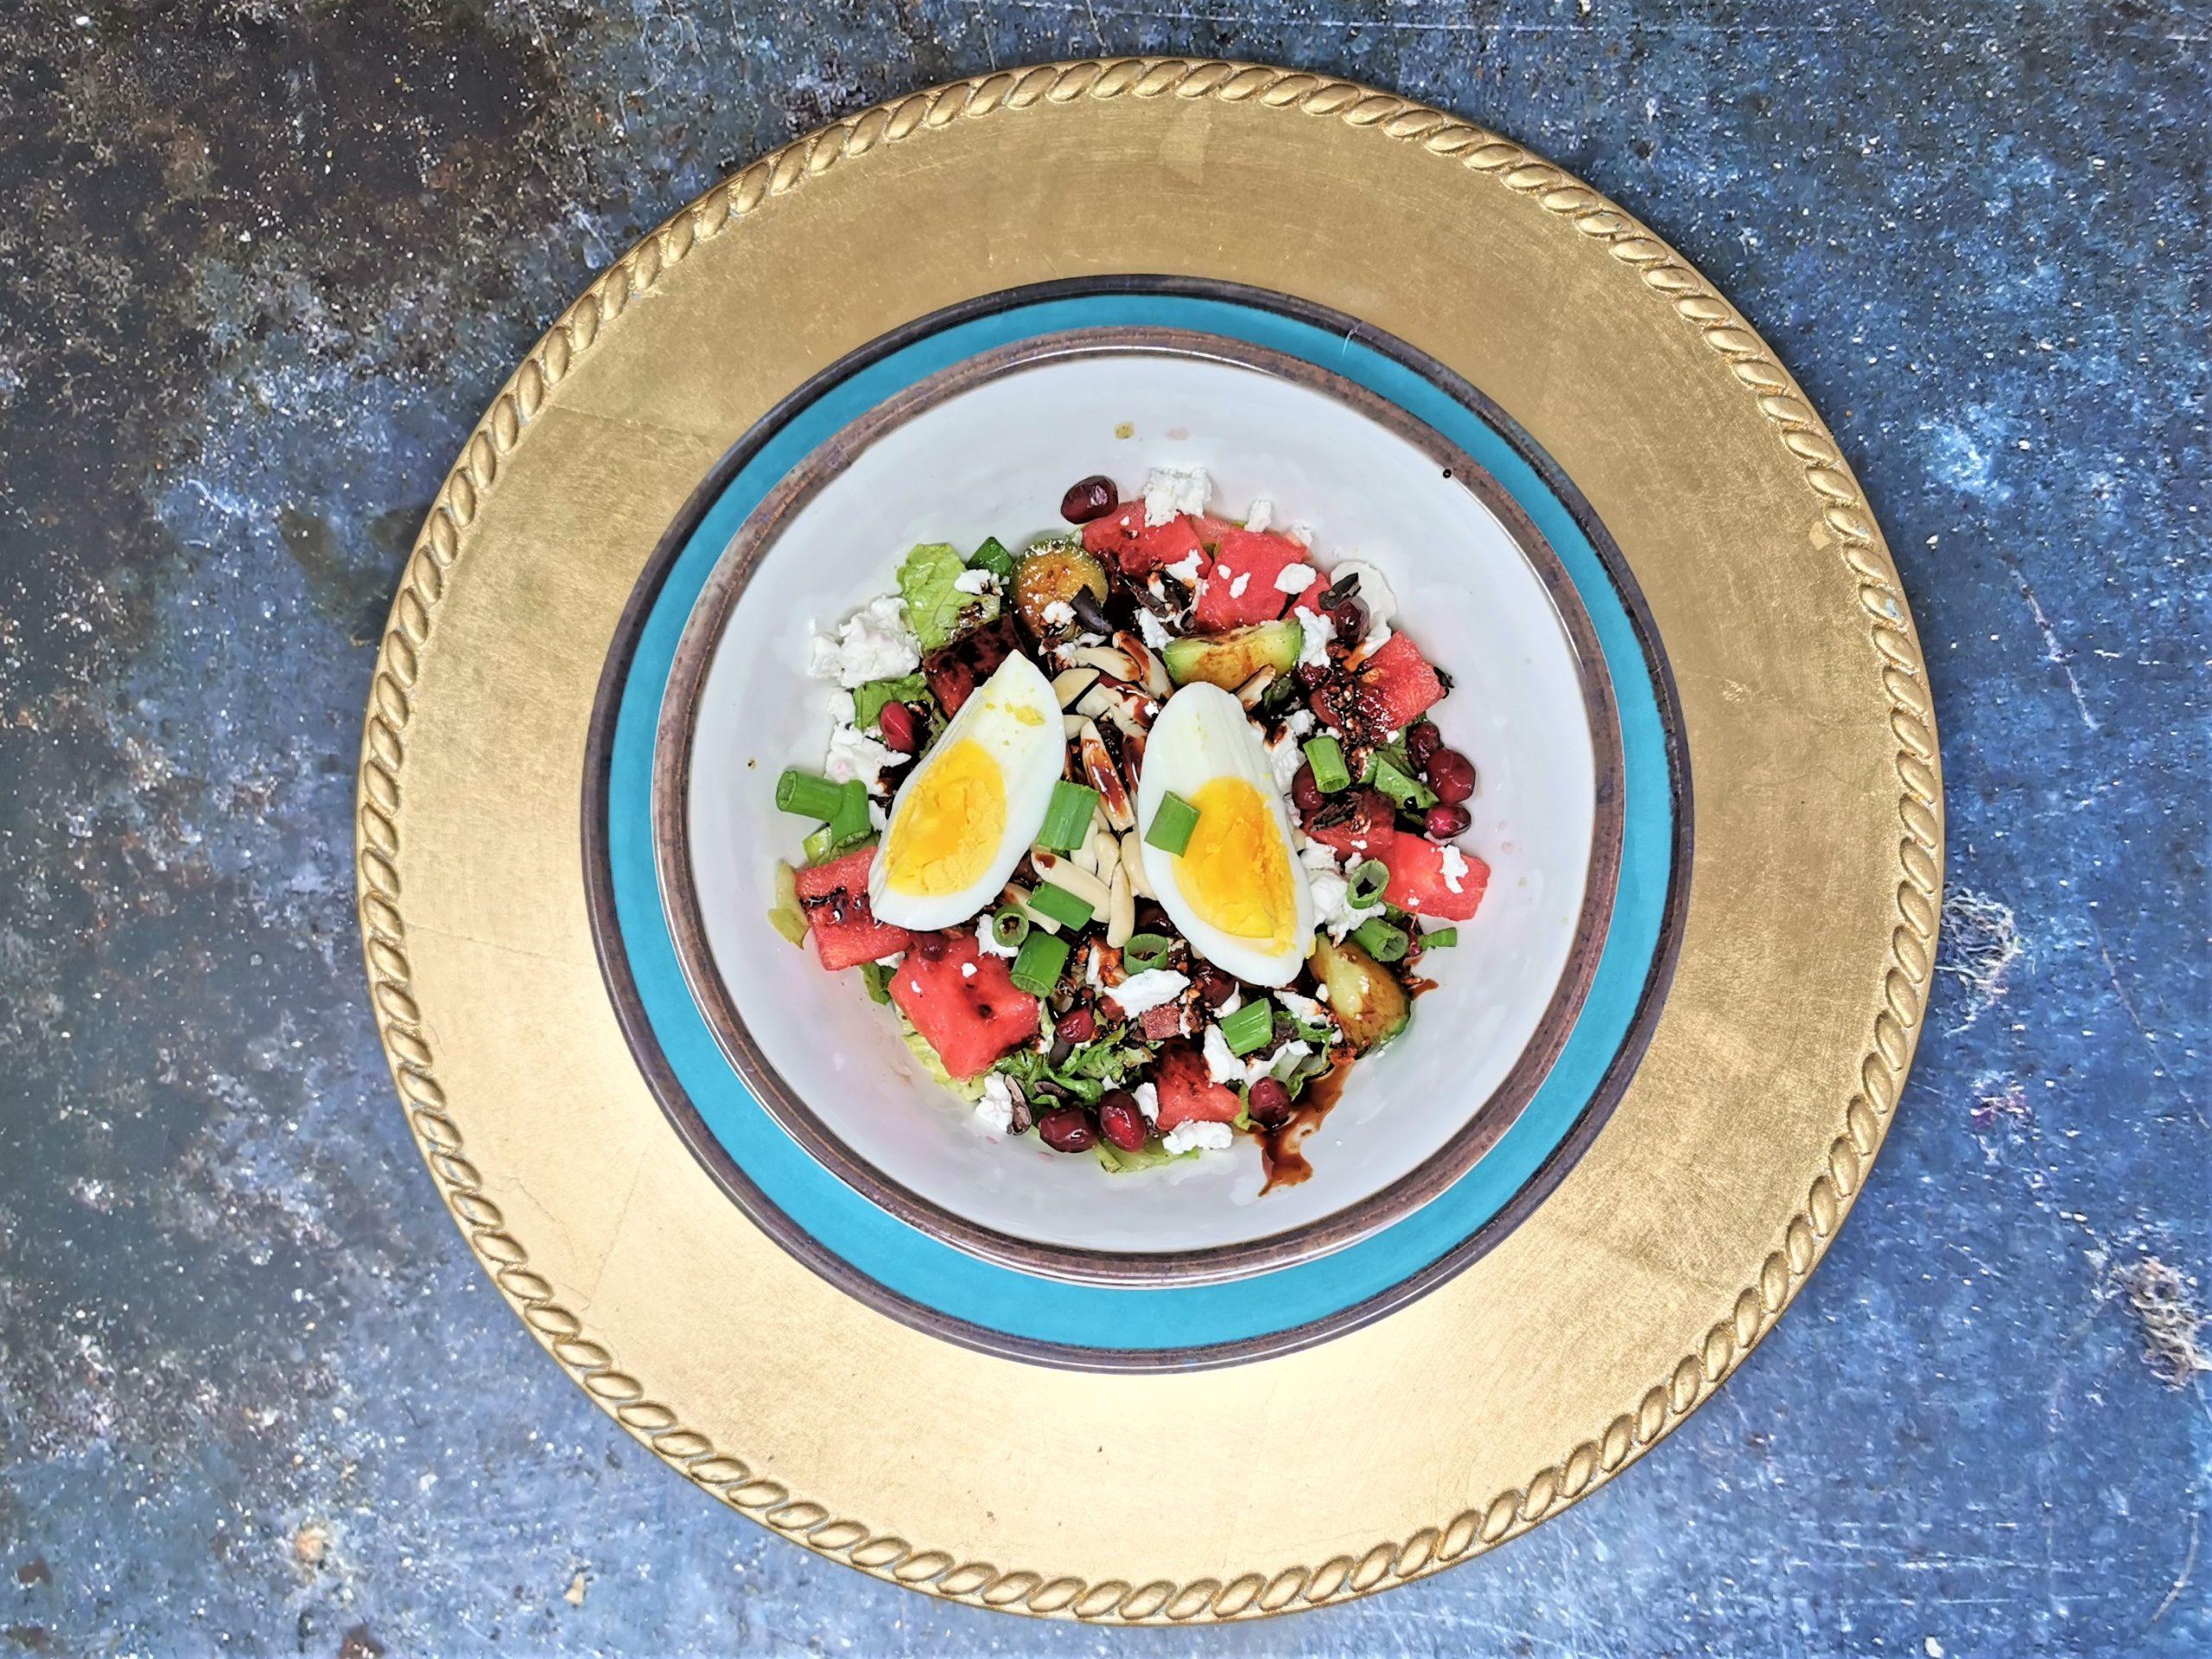 Aphrodisiac Salad with Pomegranate